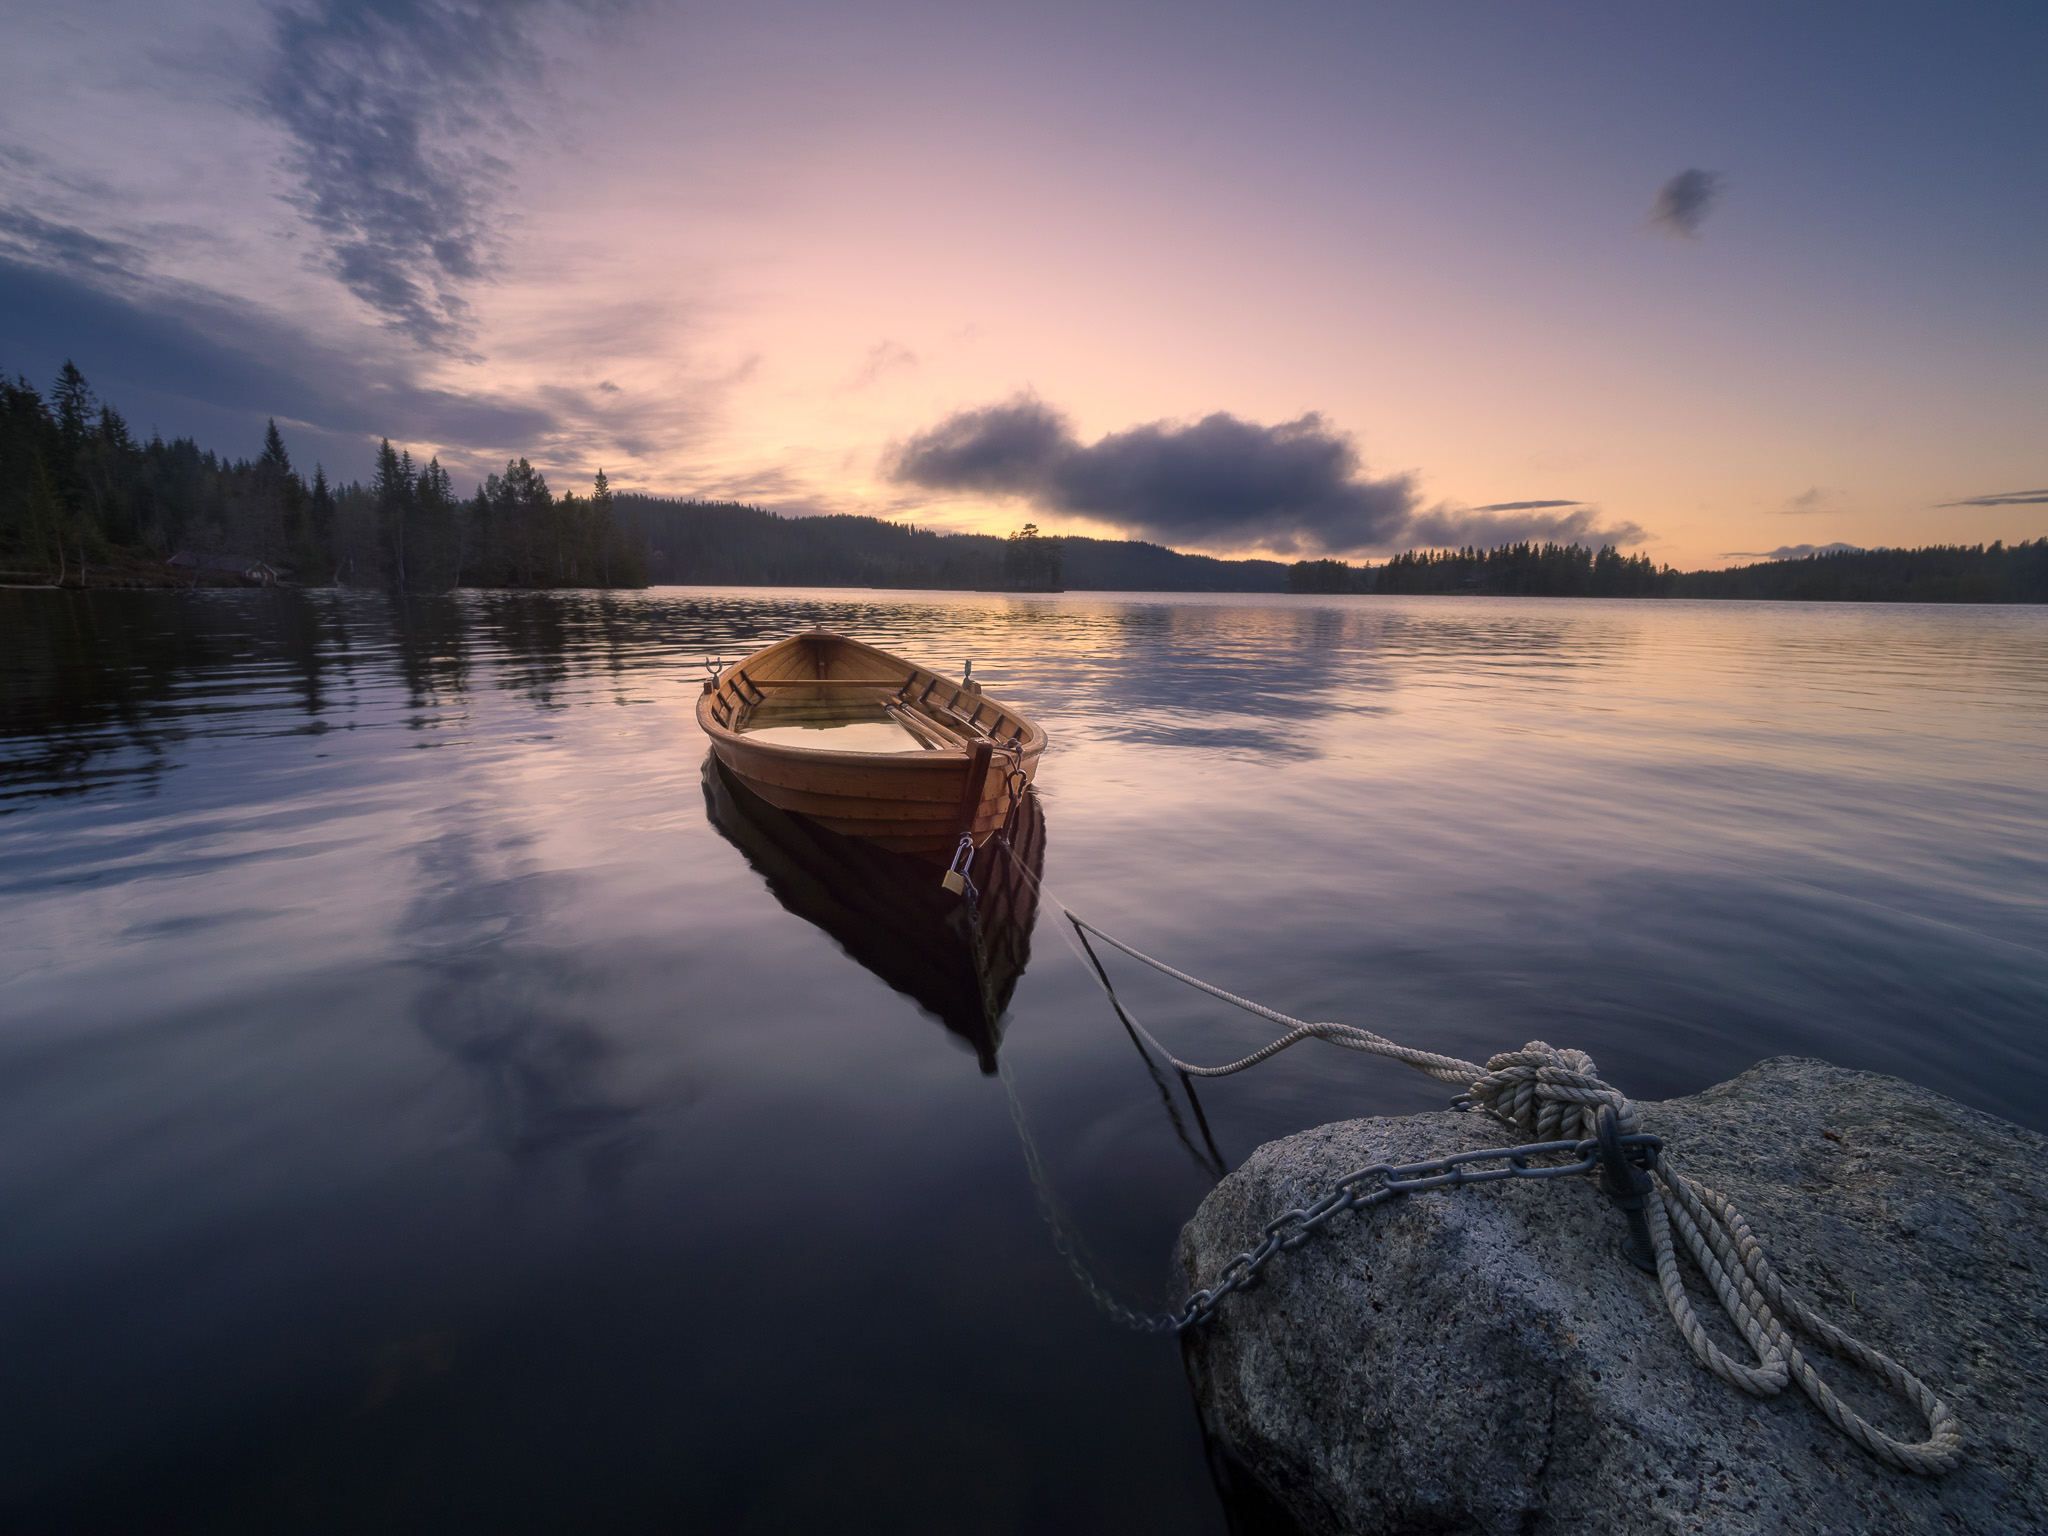 Øyangen lake, Ringerike, Norway, Norway